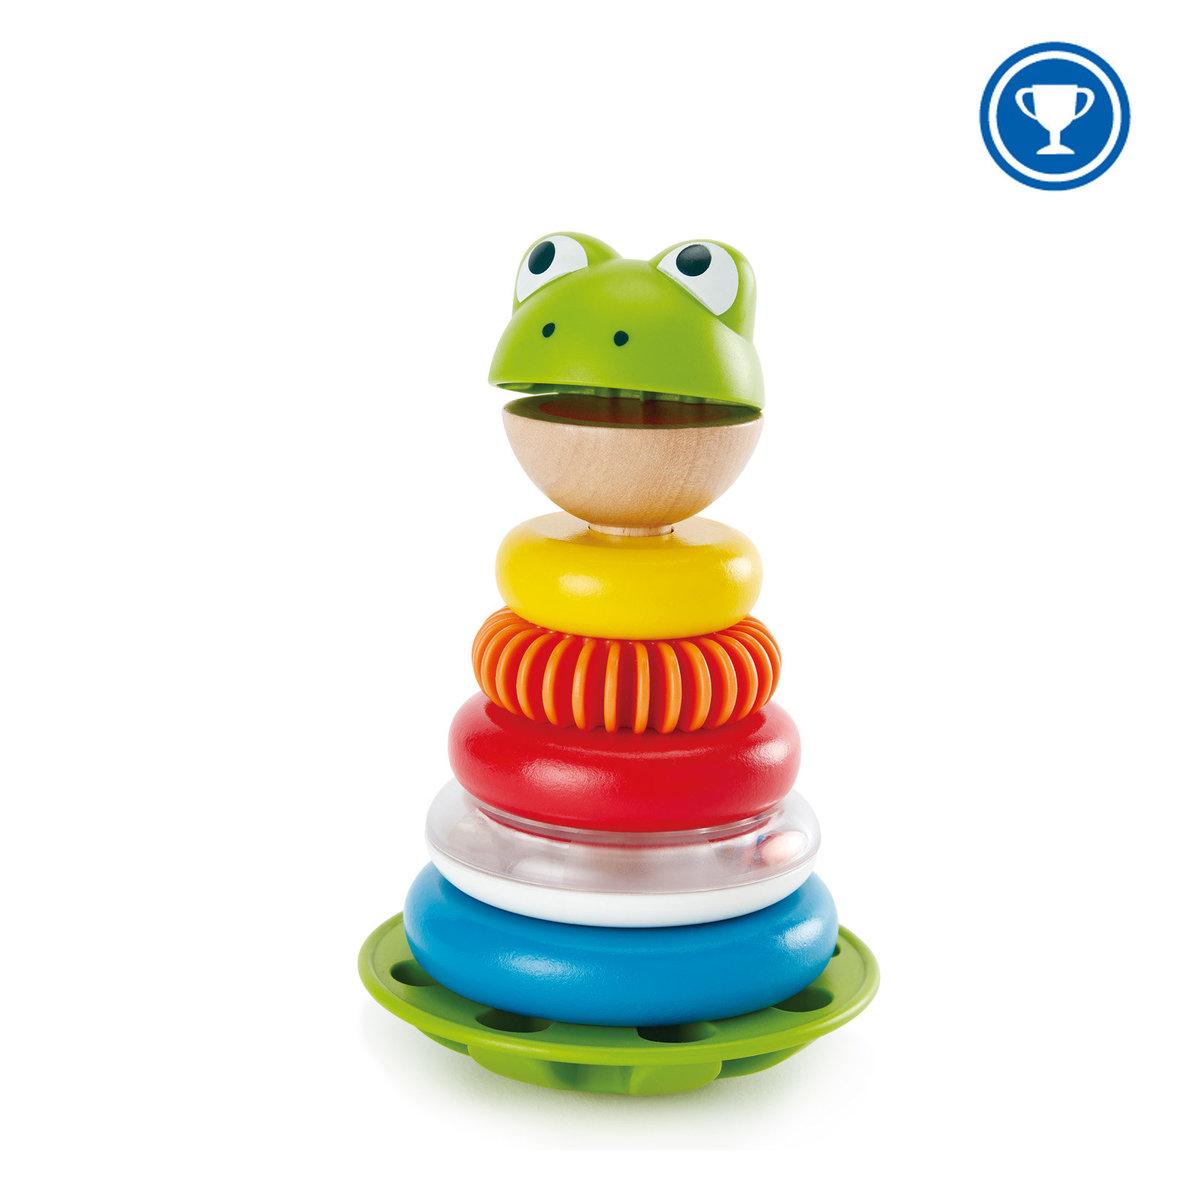 E0457-青蛙花式圓環堆塔